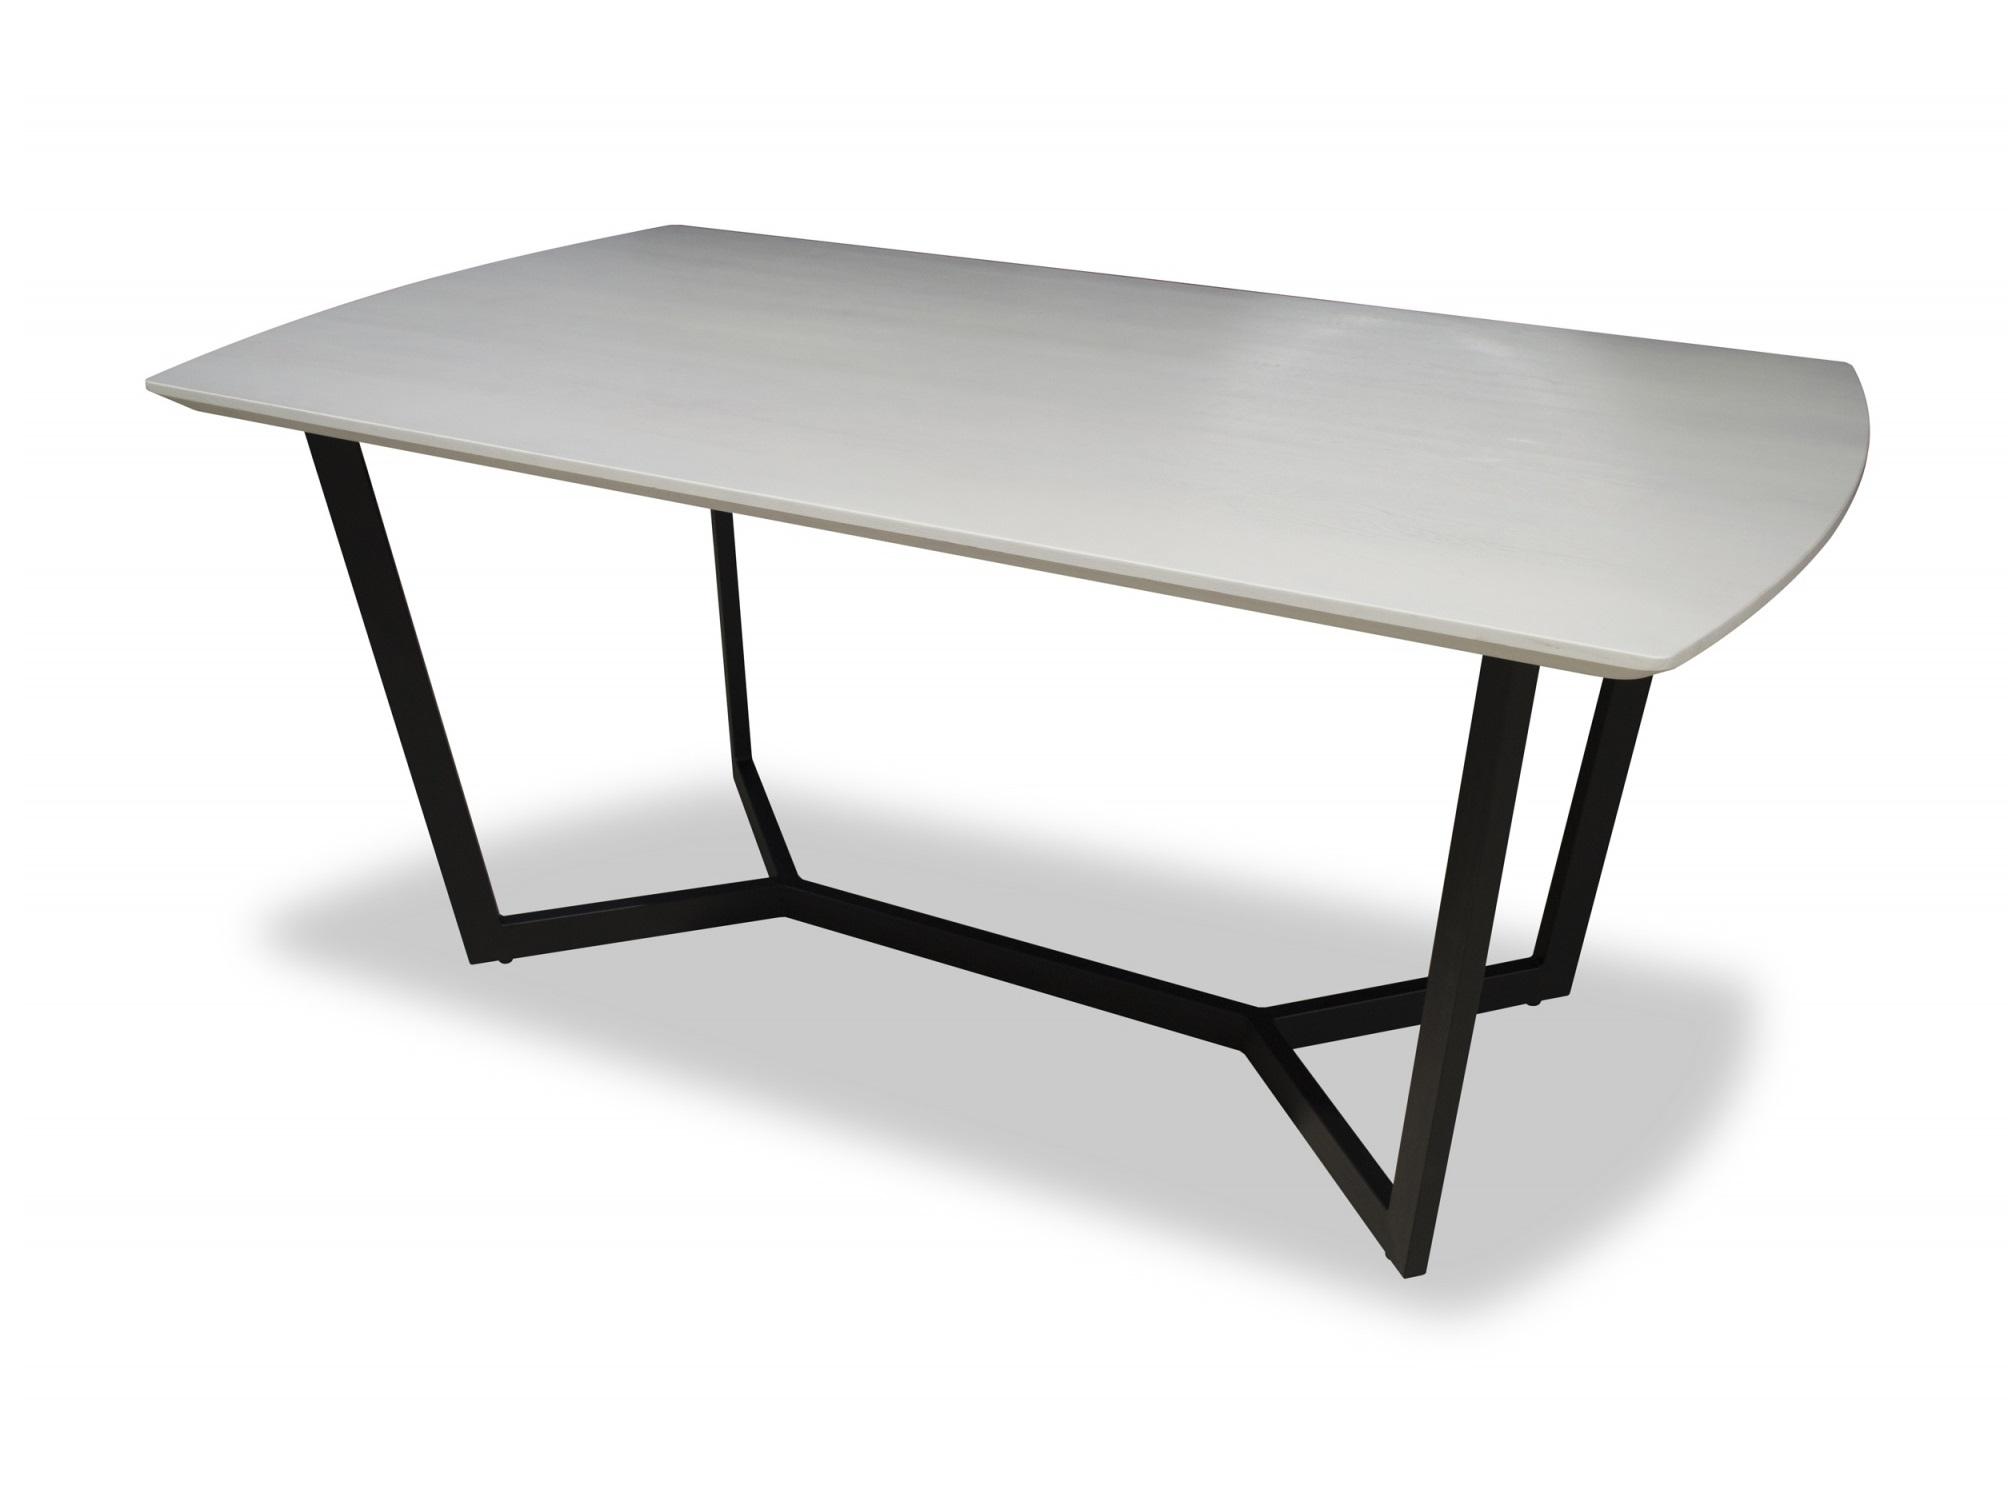 Кухонный стол Millwood 15436812 от thefurnish